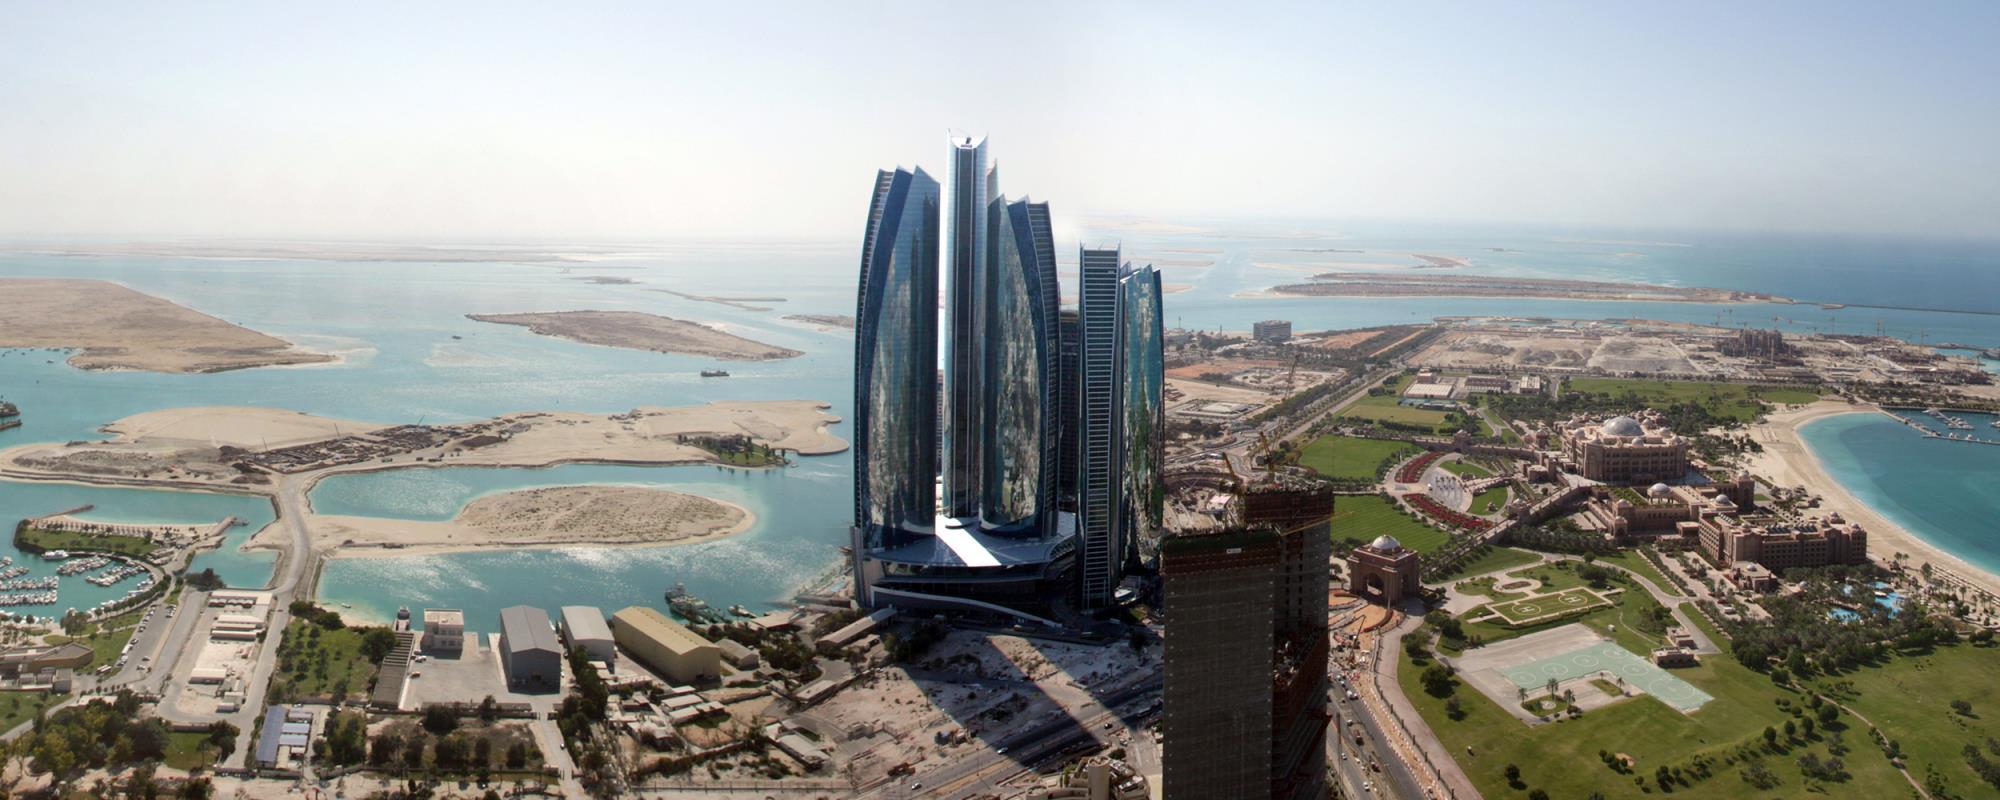 Free two night Abu Dhabi stopover in 2019 - flights.etihad.com